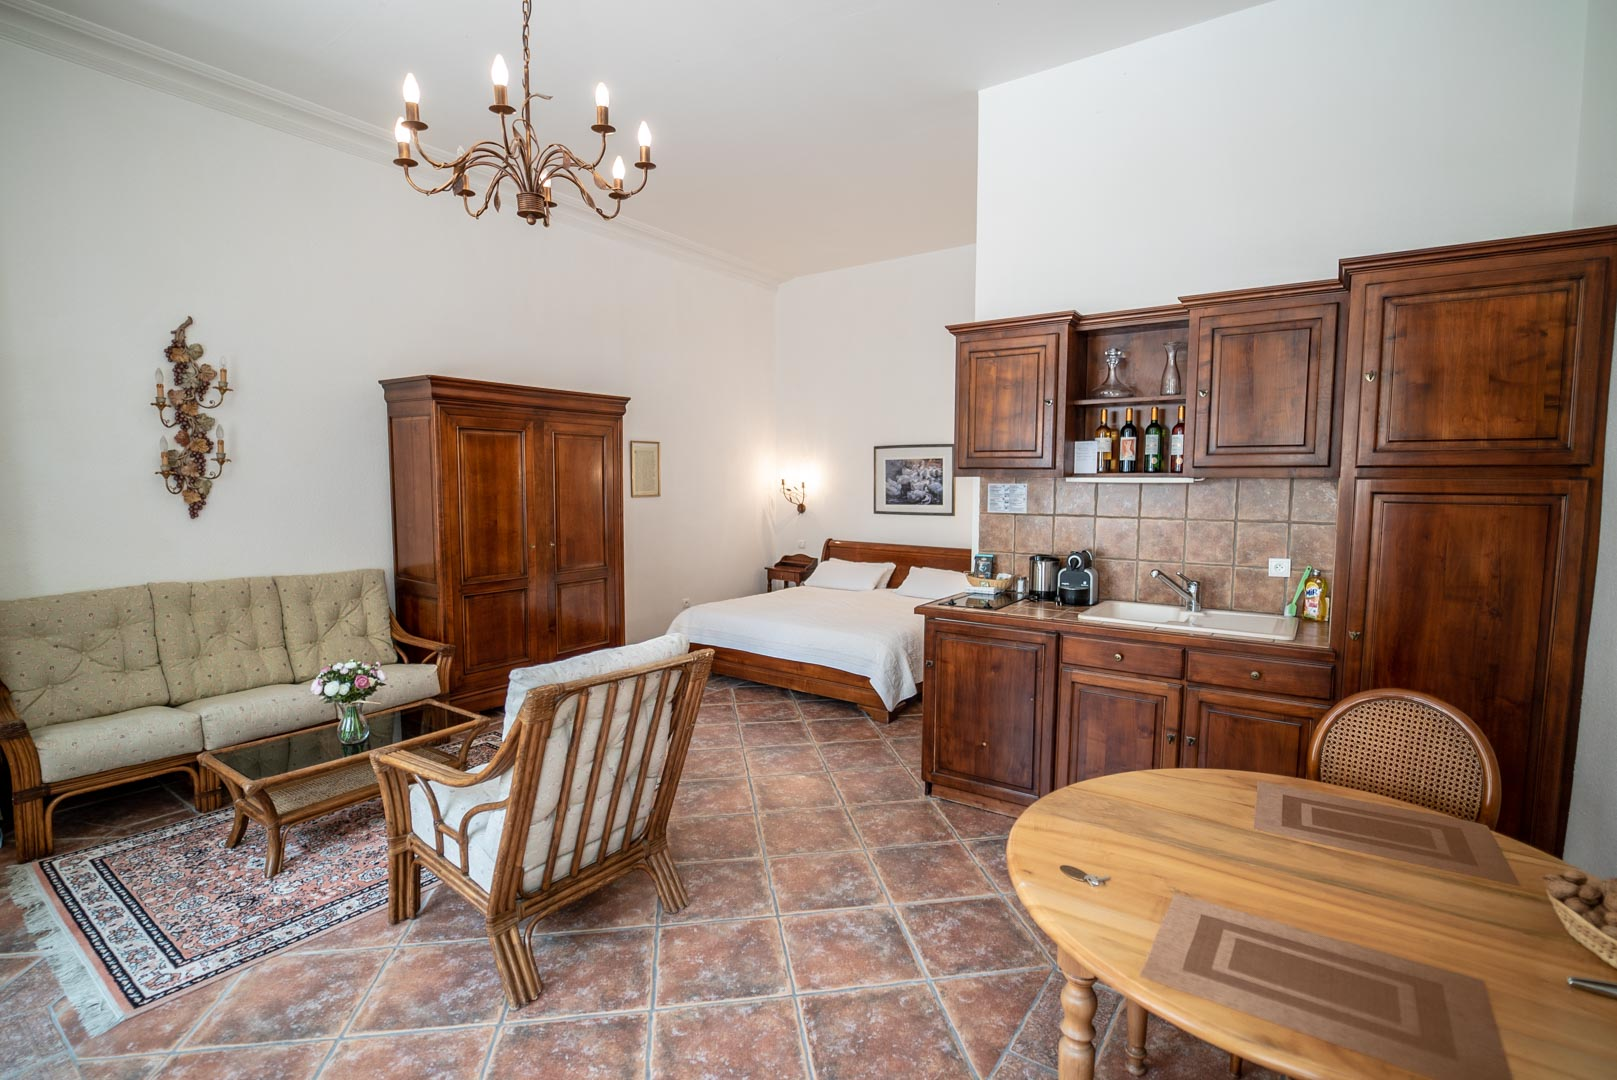 Studio Chateau Rauly location bergerac Monbazillac